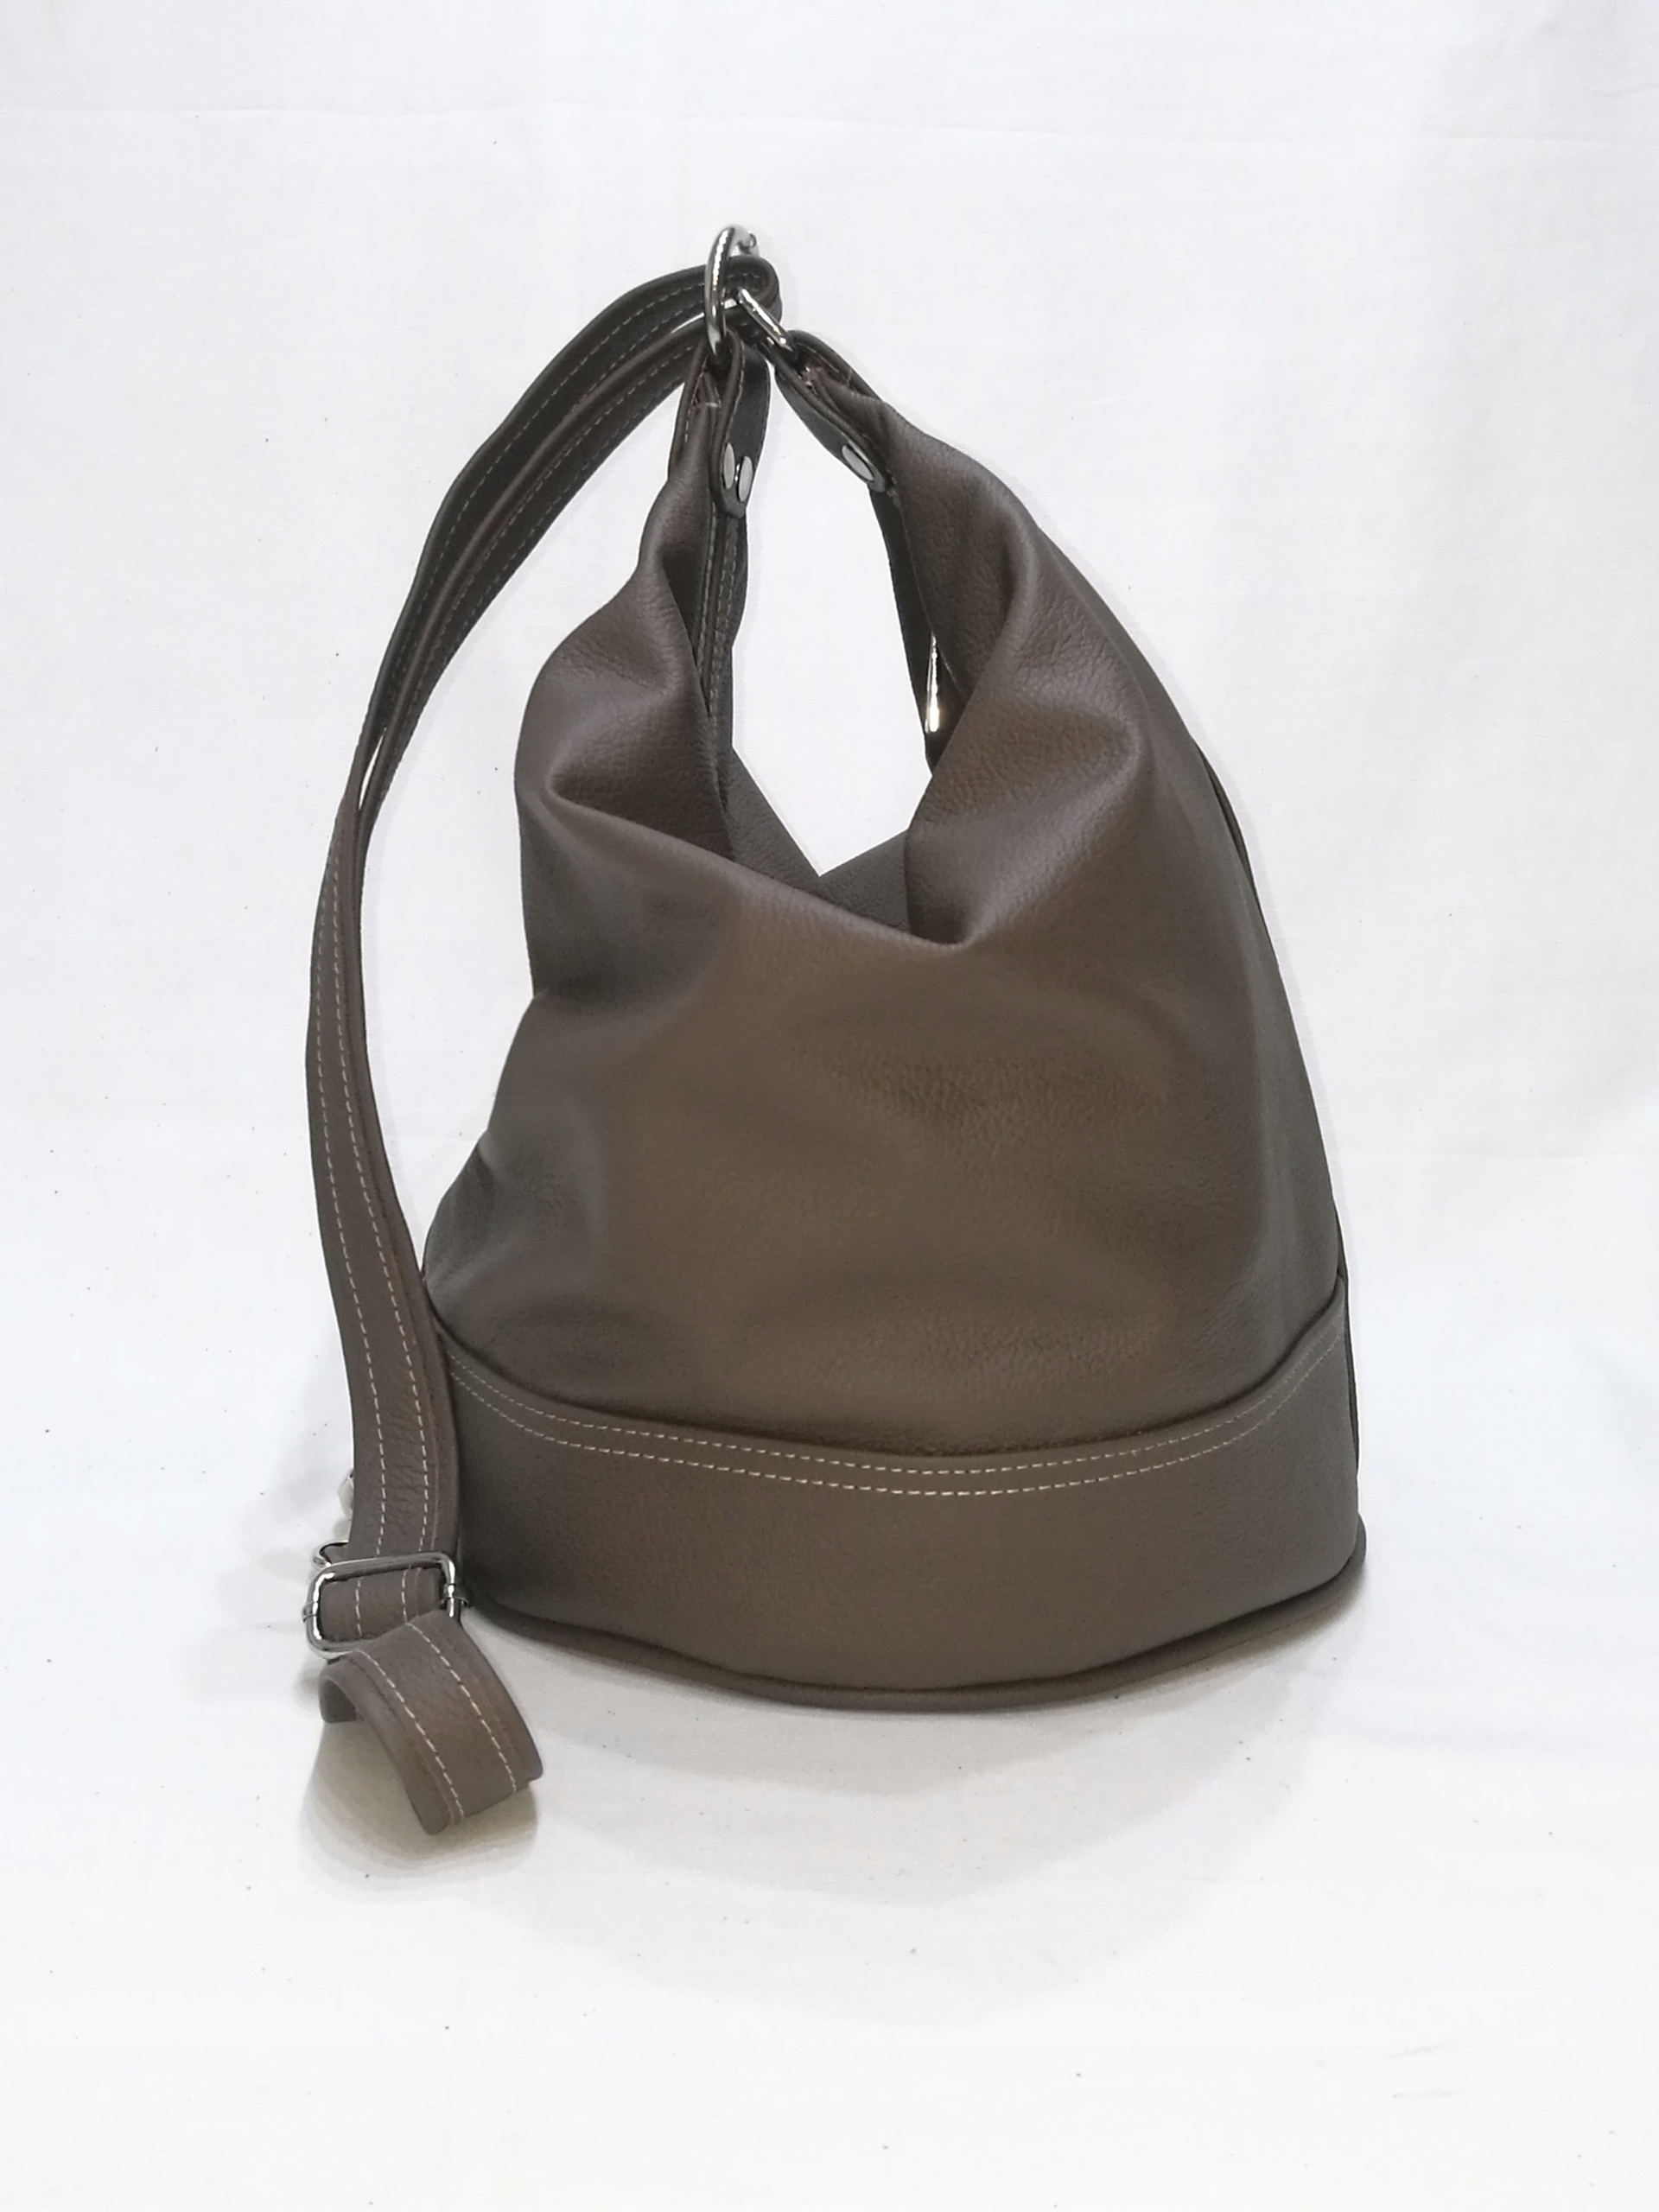 3eb4fb2399a3a Skórzany worko-plecak brąz handmade SQRATORIUM - 7597449501 ...